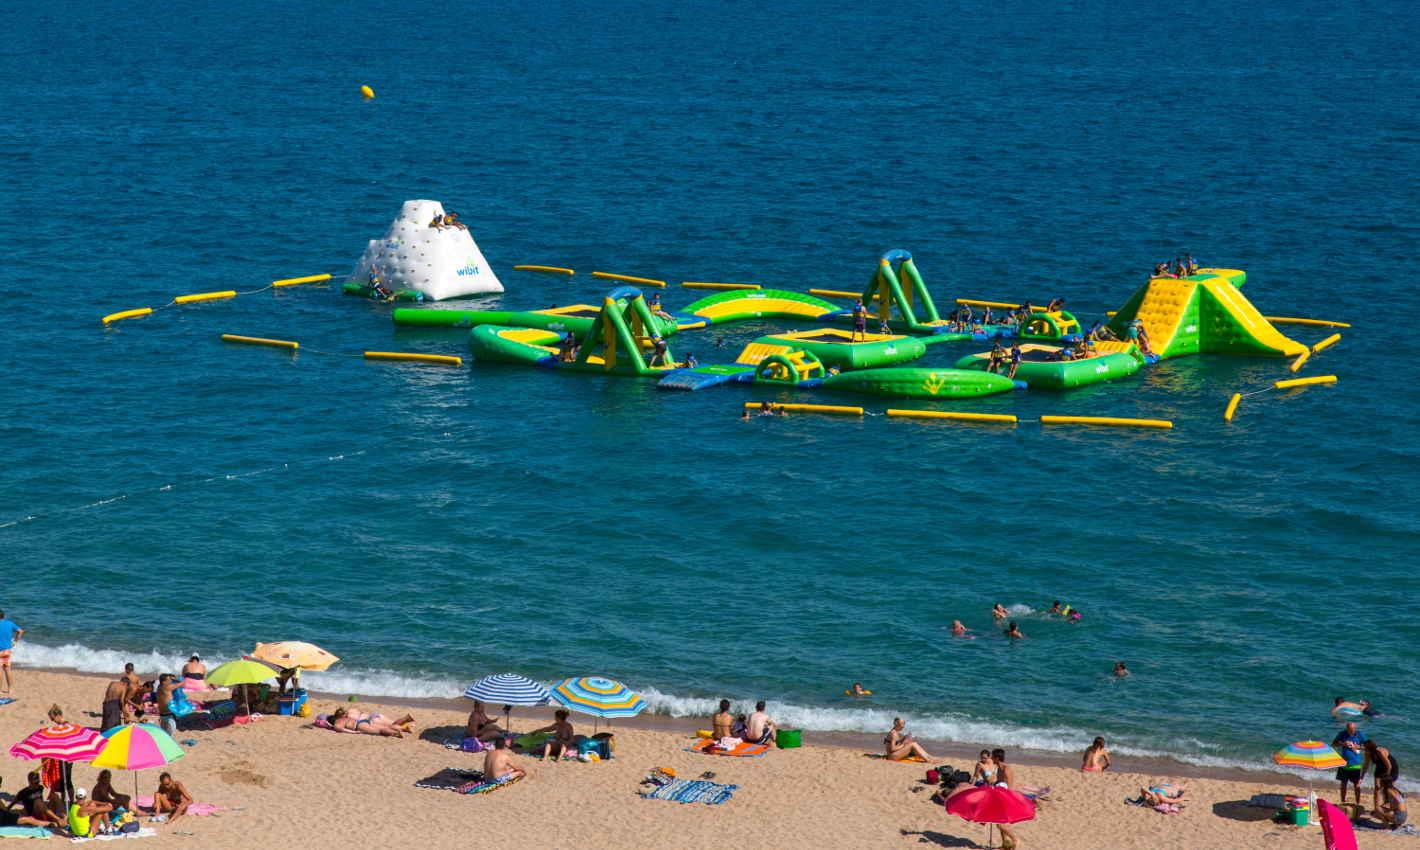 platja-garbi-maraventura-sports-park